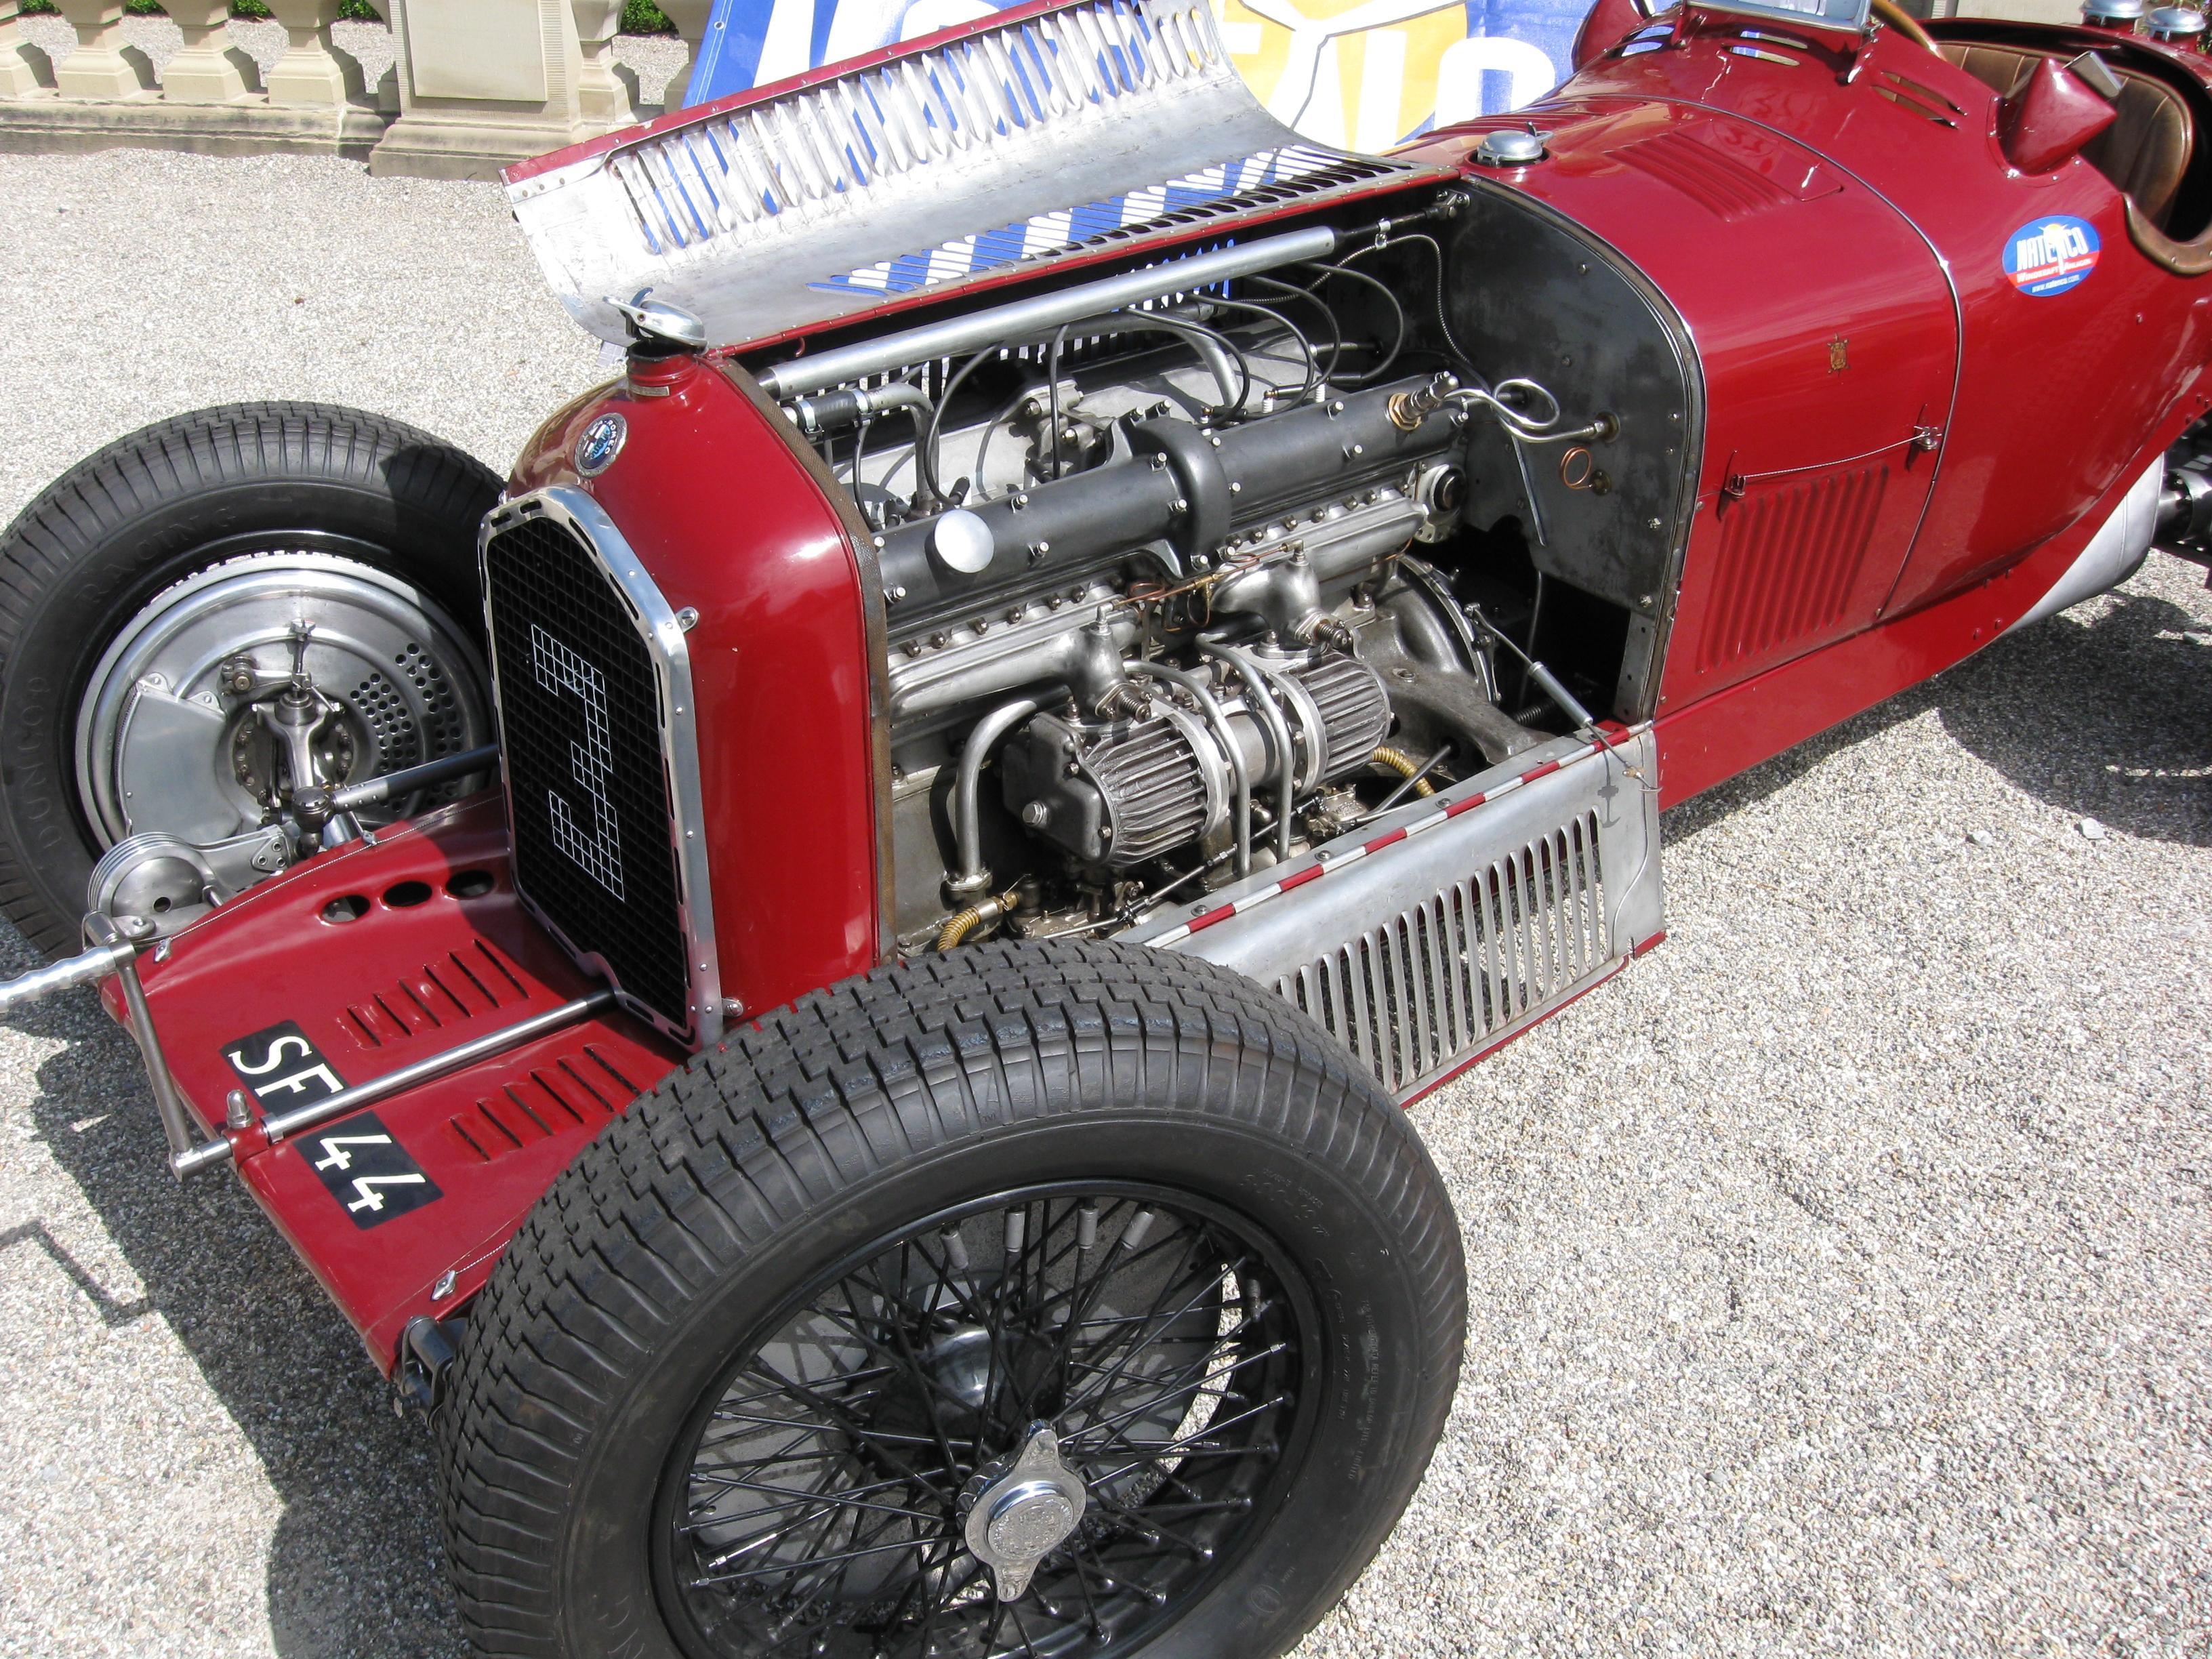 All about Antique Vintage and PreWar Cars  PreWarCar